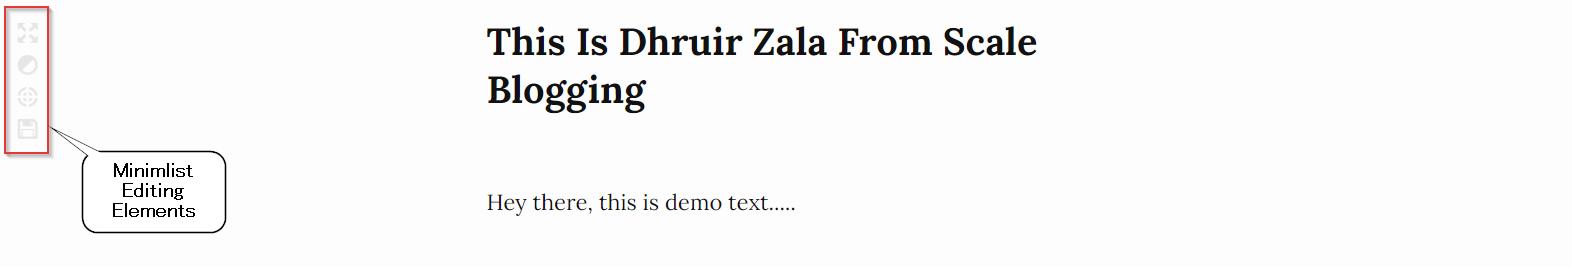 ZenPen distraction-free writing tool